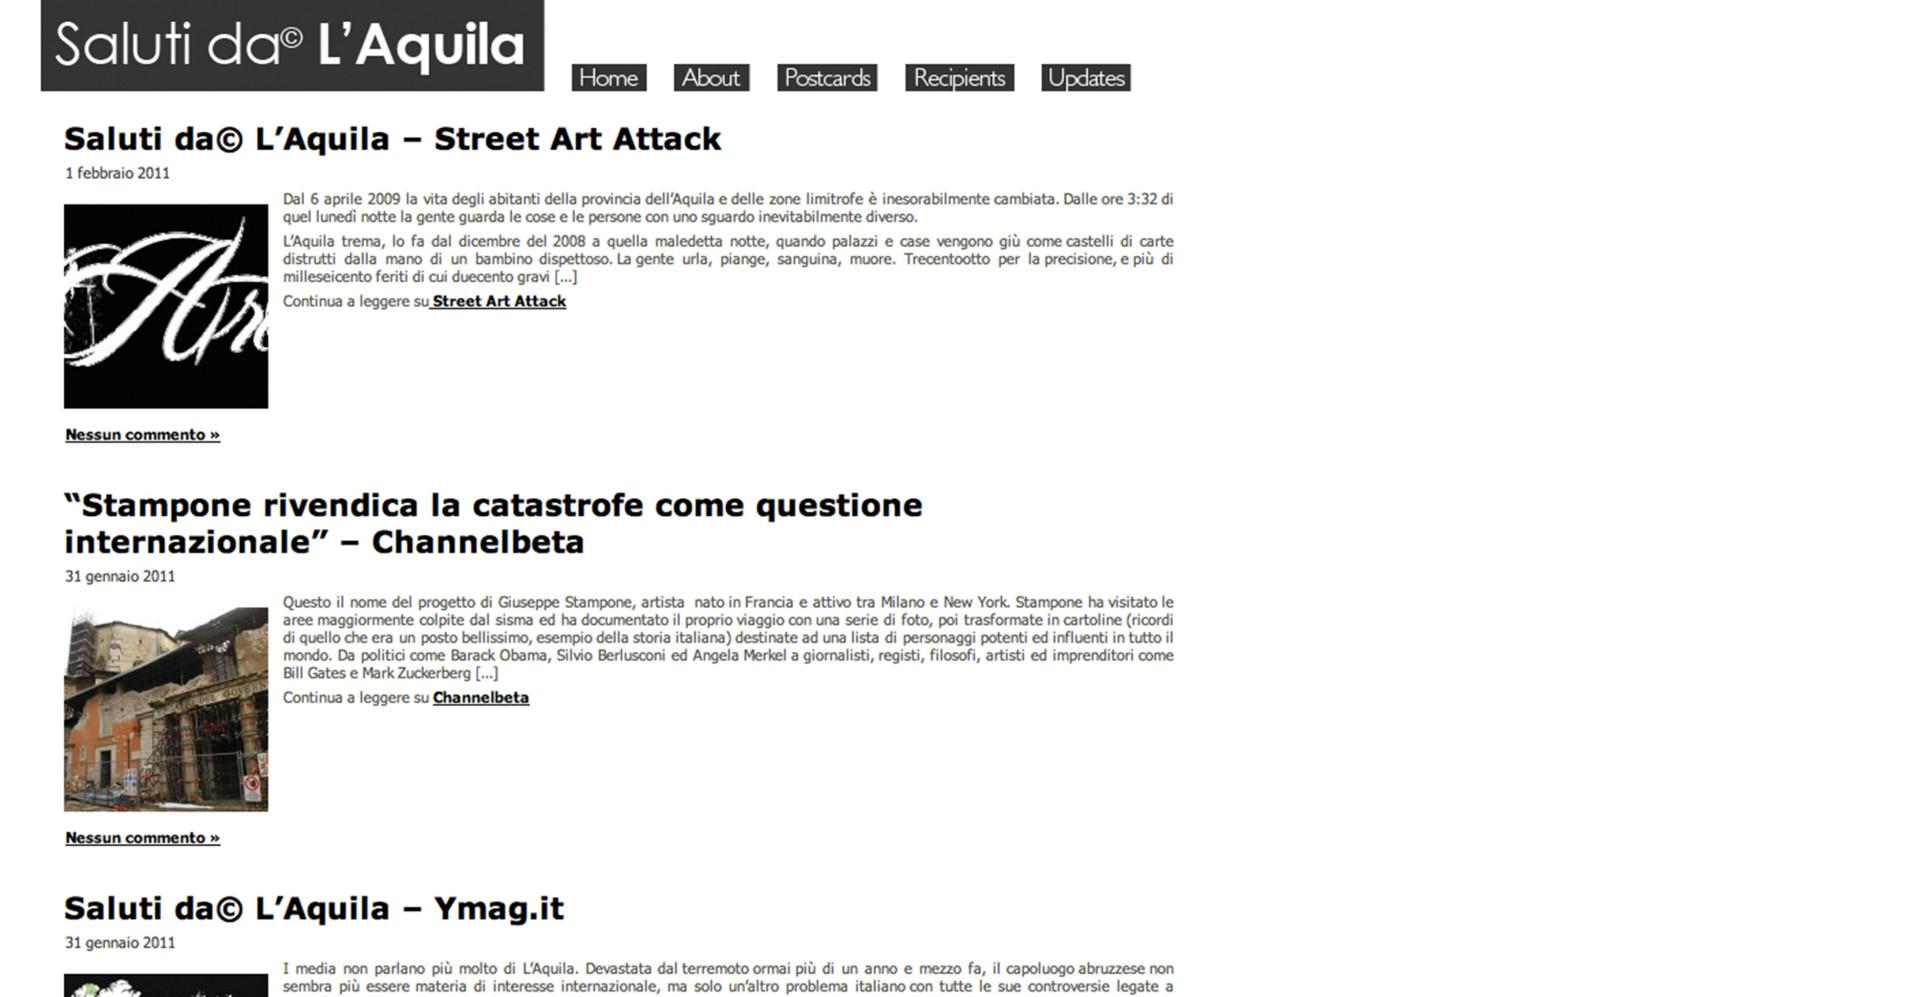 Saluti da L'Aquila schermata9_bassa